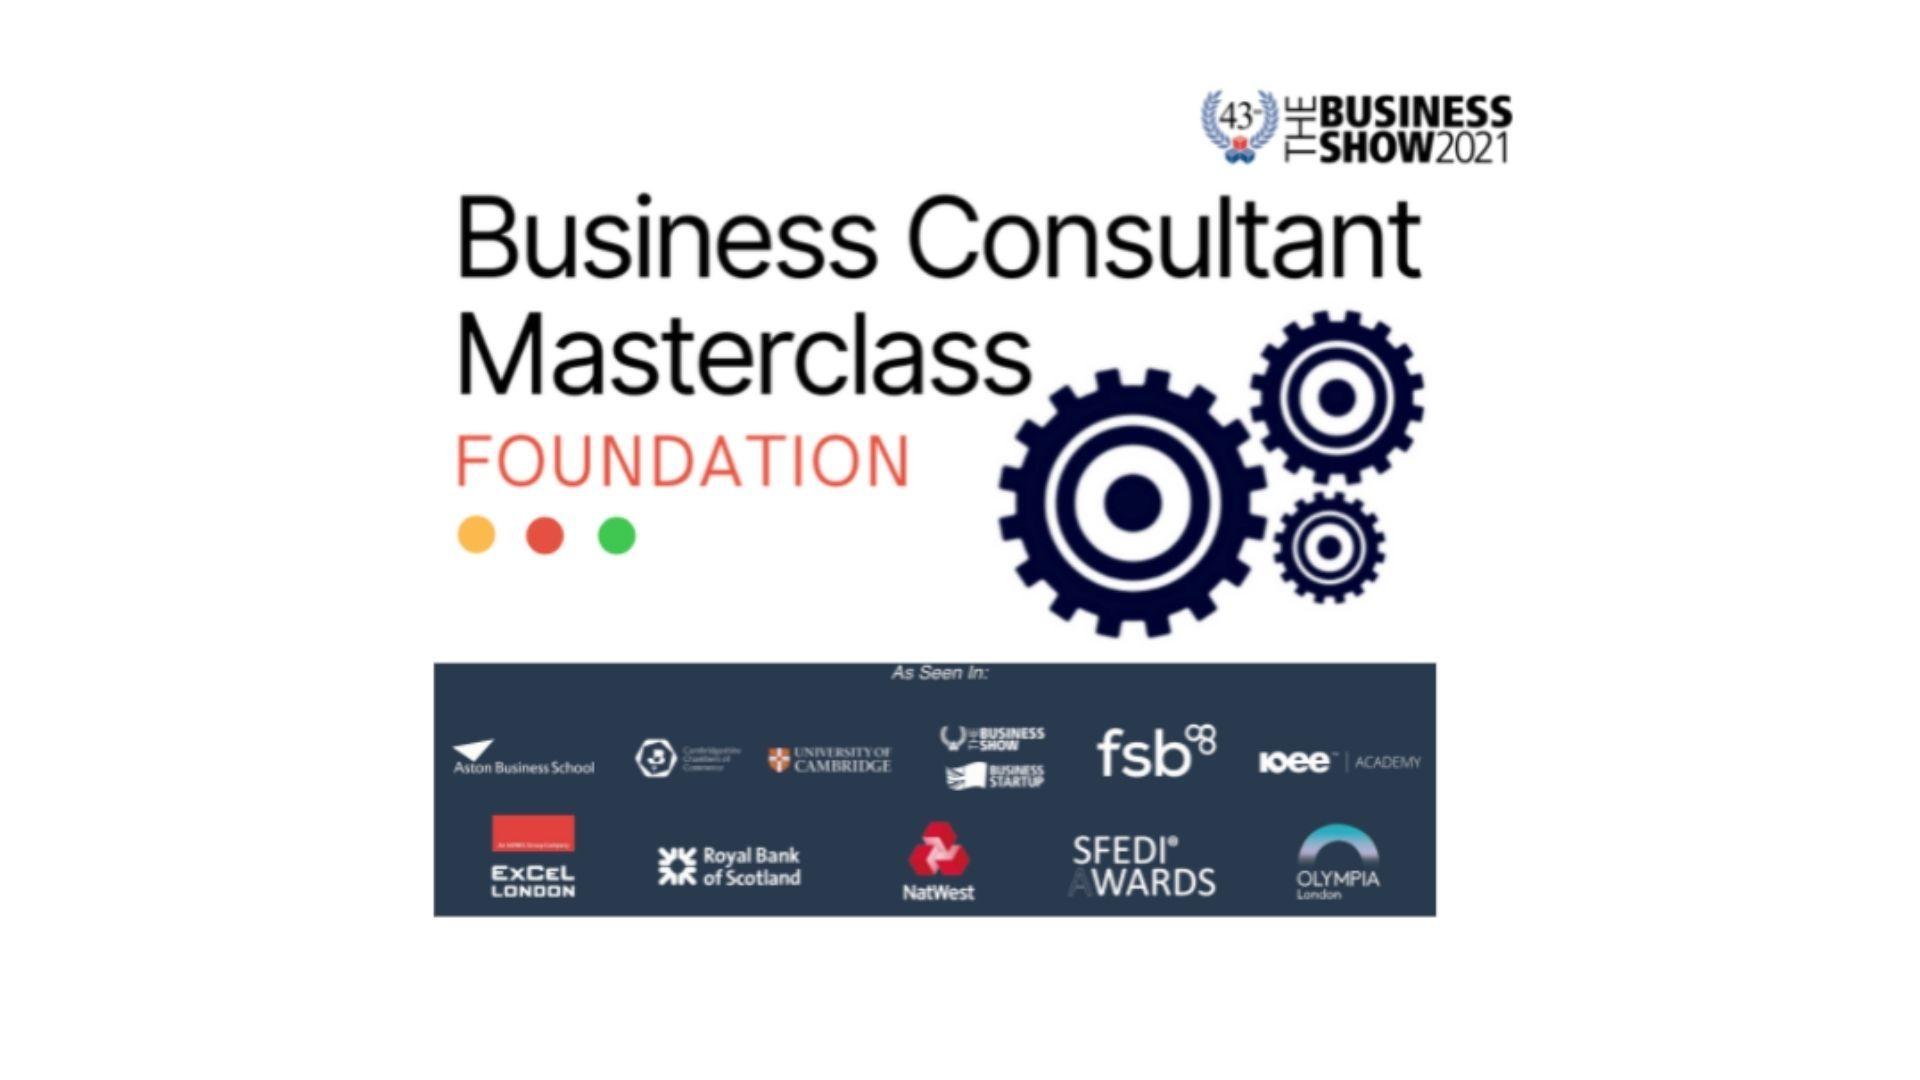 Business Consultant Masterclasss